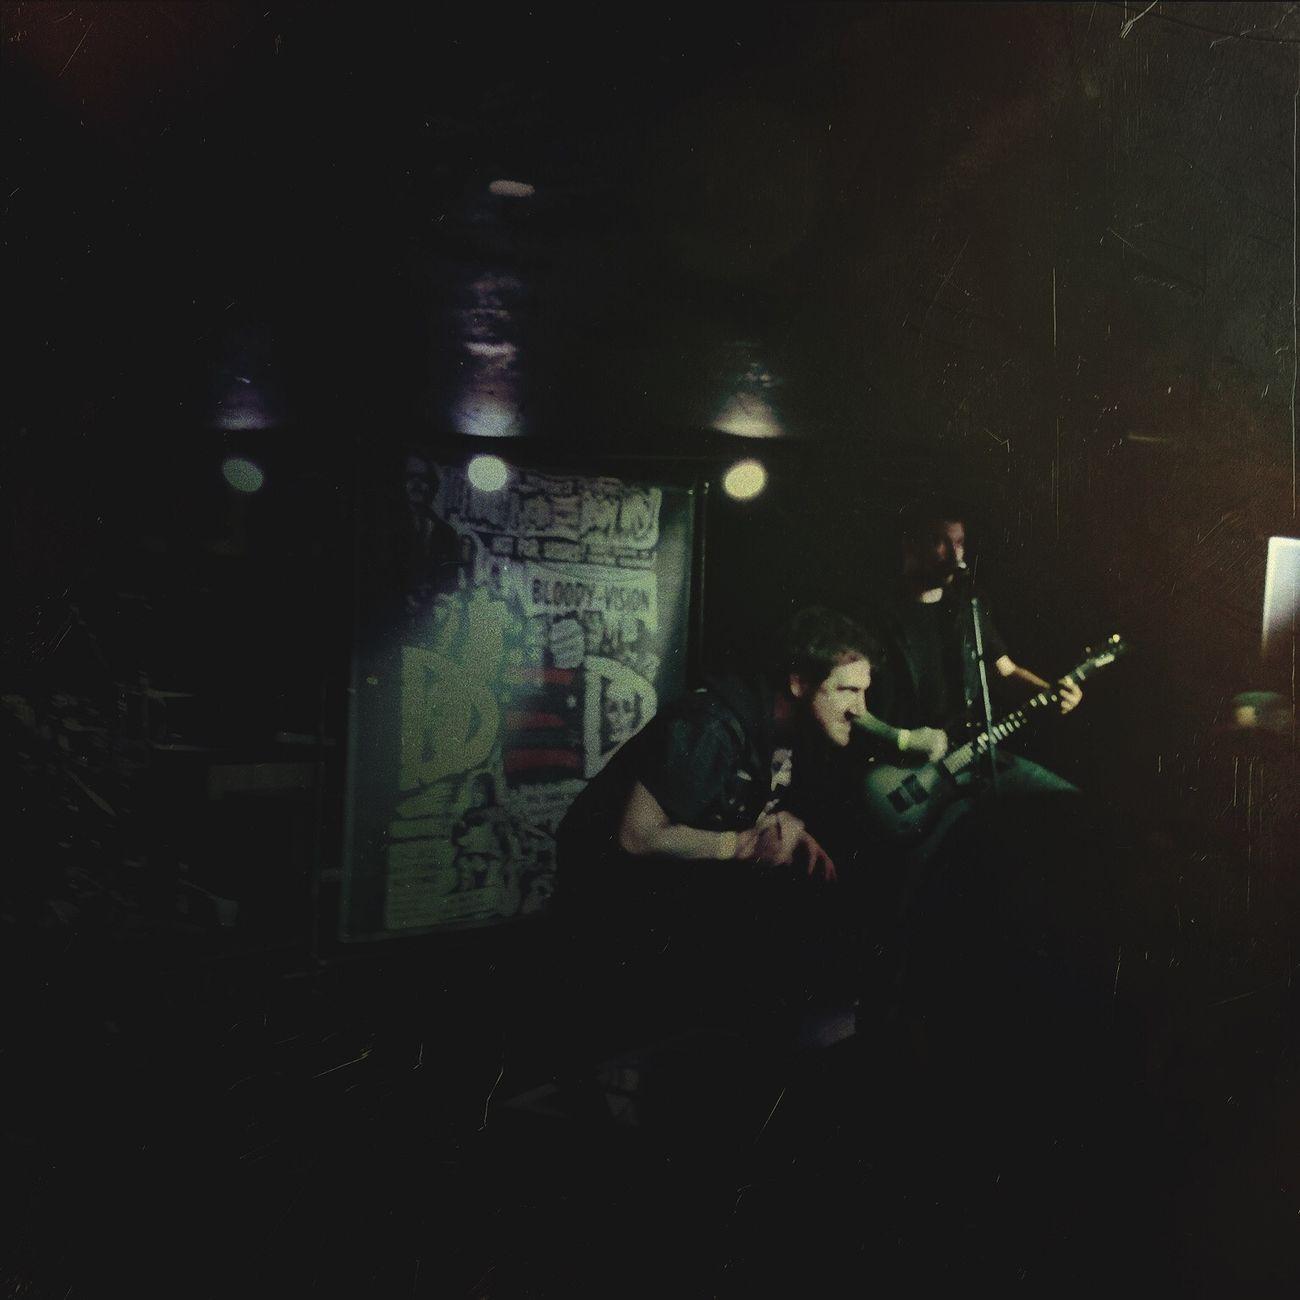 Metal Live Music Rock'n'Roll Ded Tempearizona Meeting Friends Mextures Arizona Heavy Metal Band